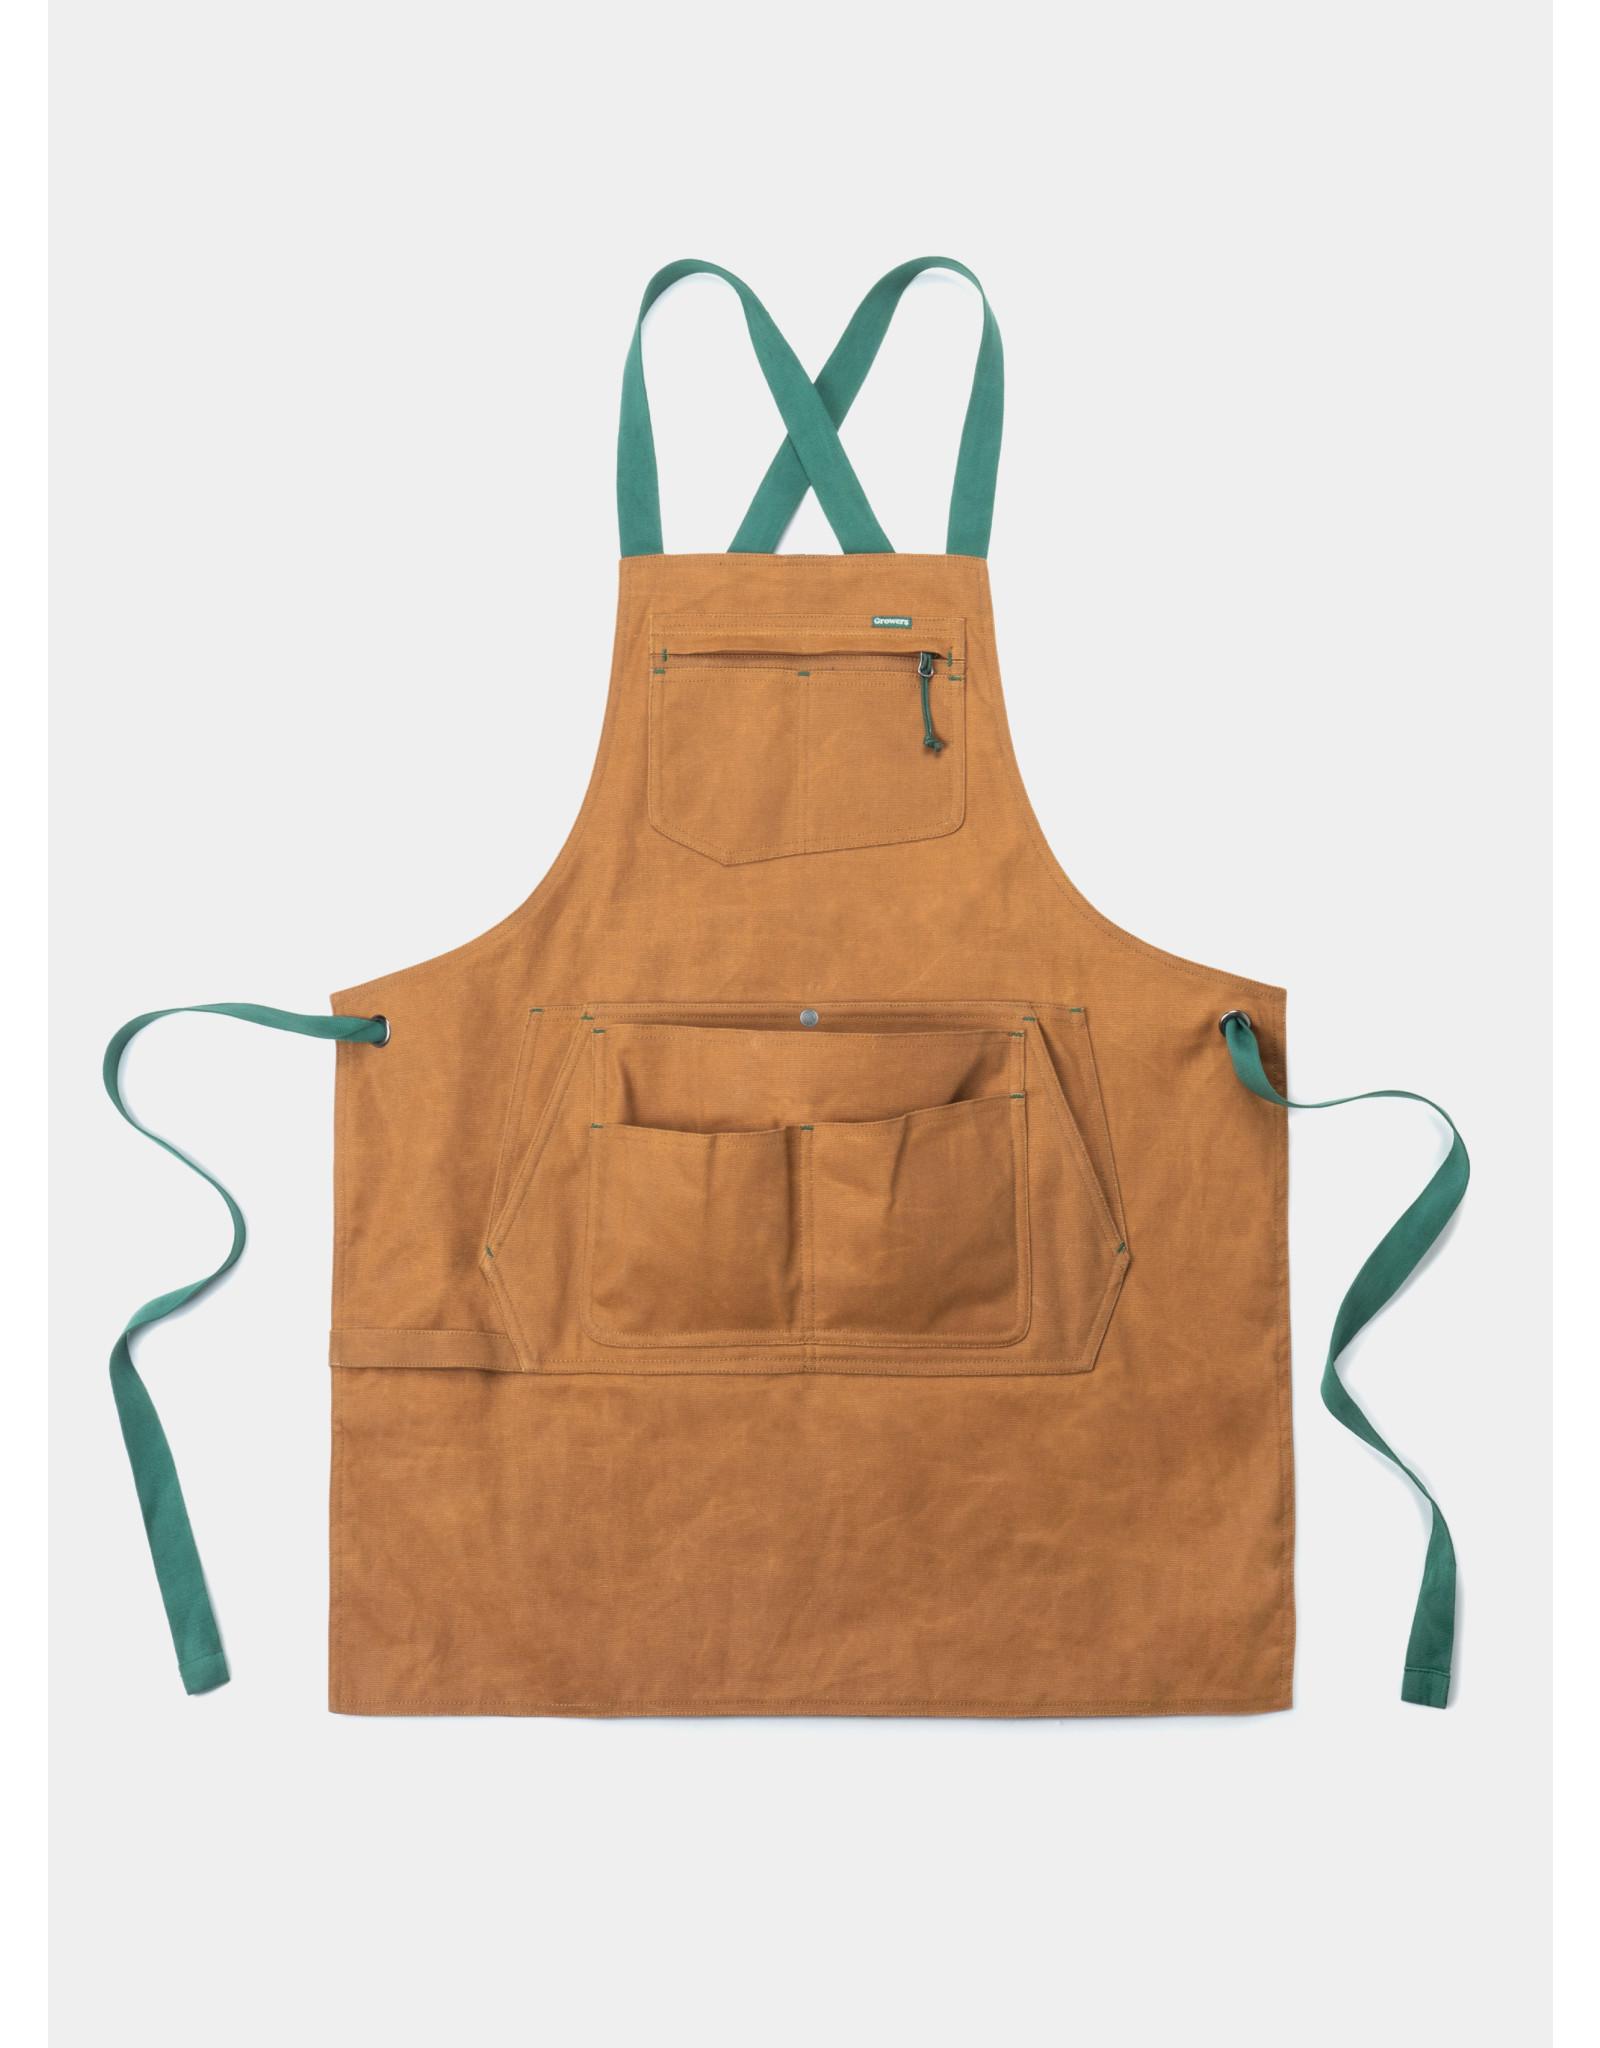 Growers&co Market apron